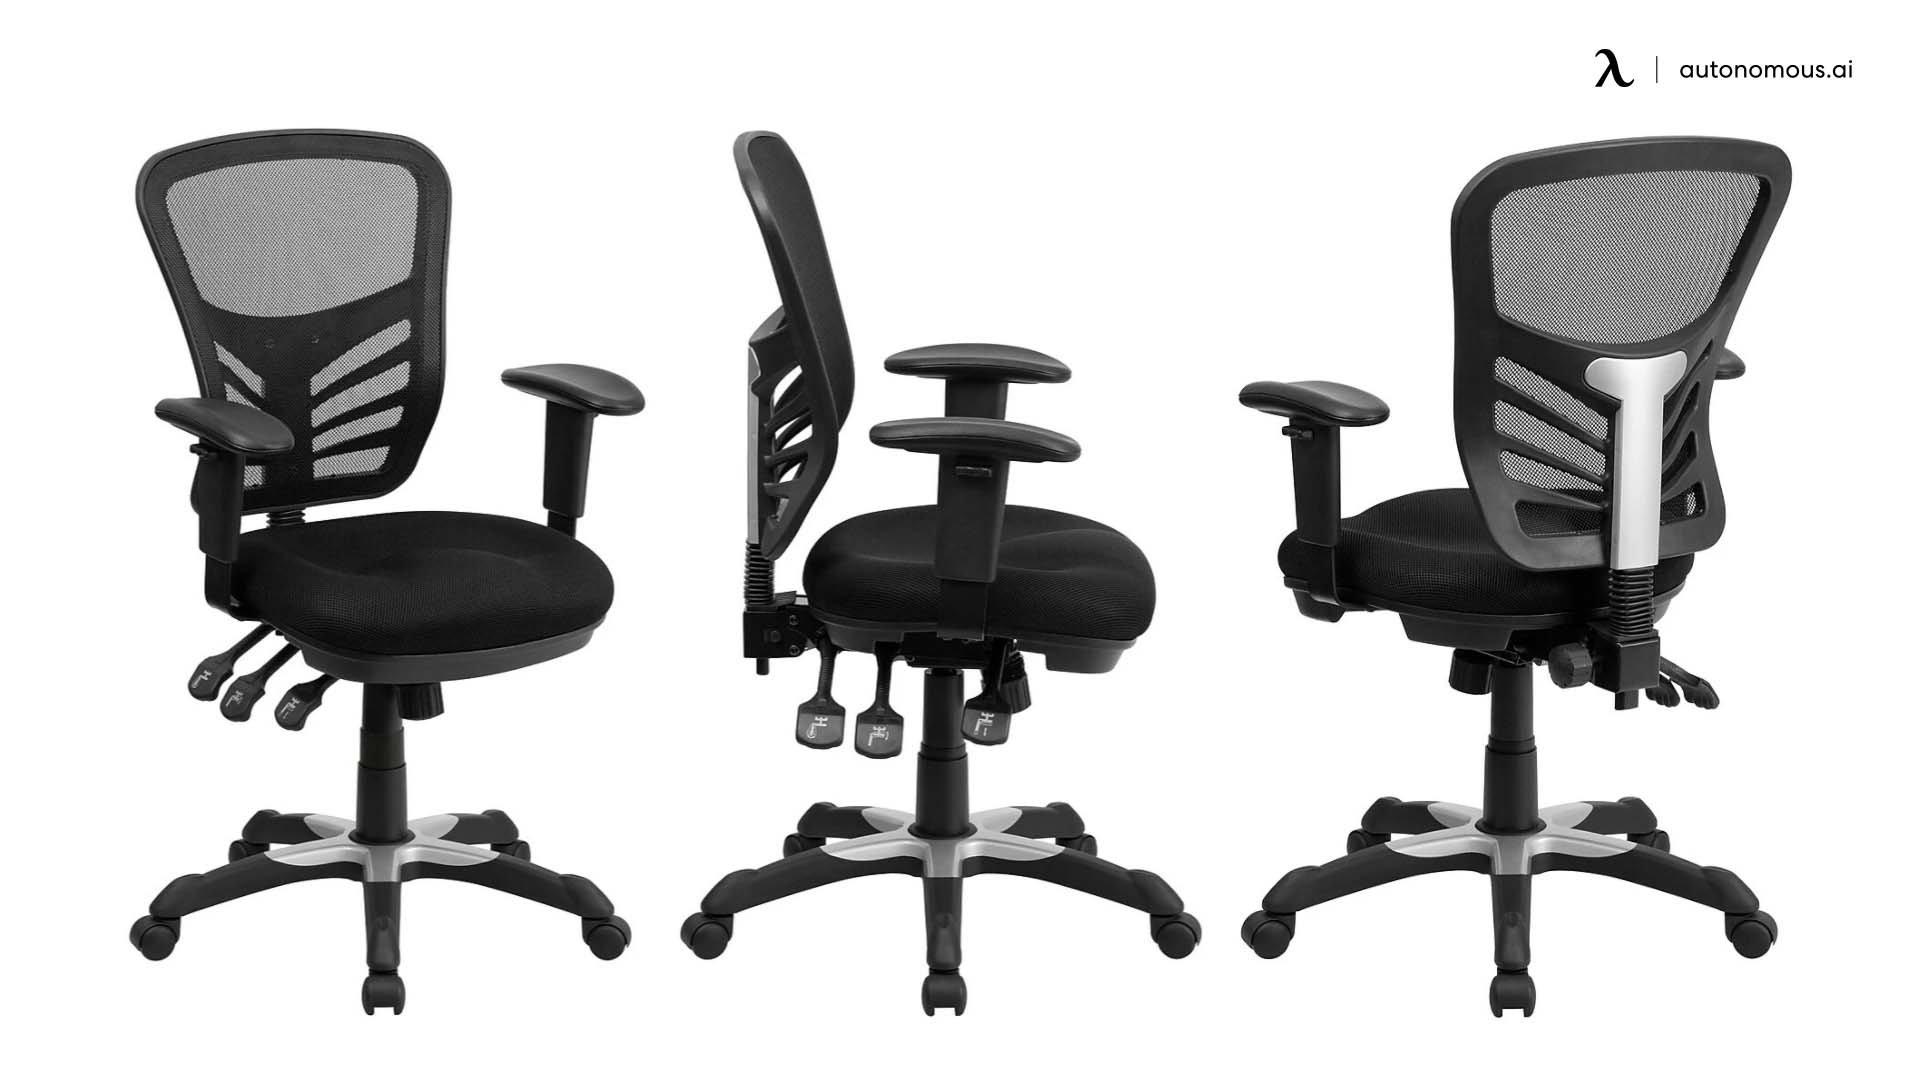 BizChair Mid-Back Mesh Multifunction Executive Swivel Ergonomic Office Chair